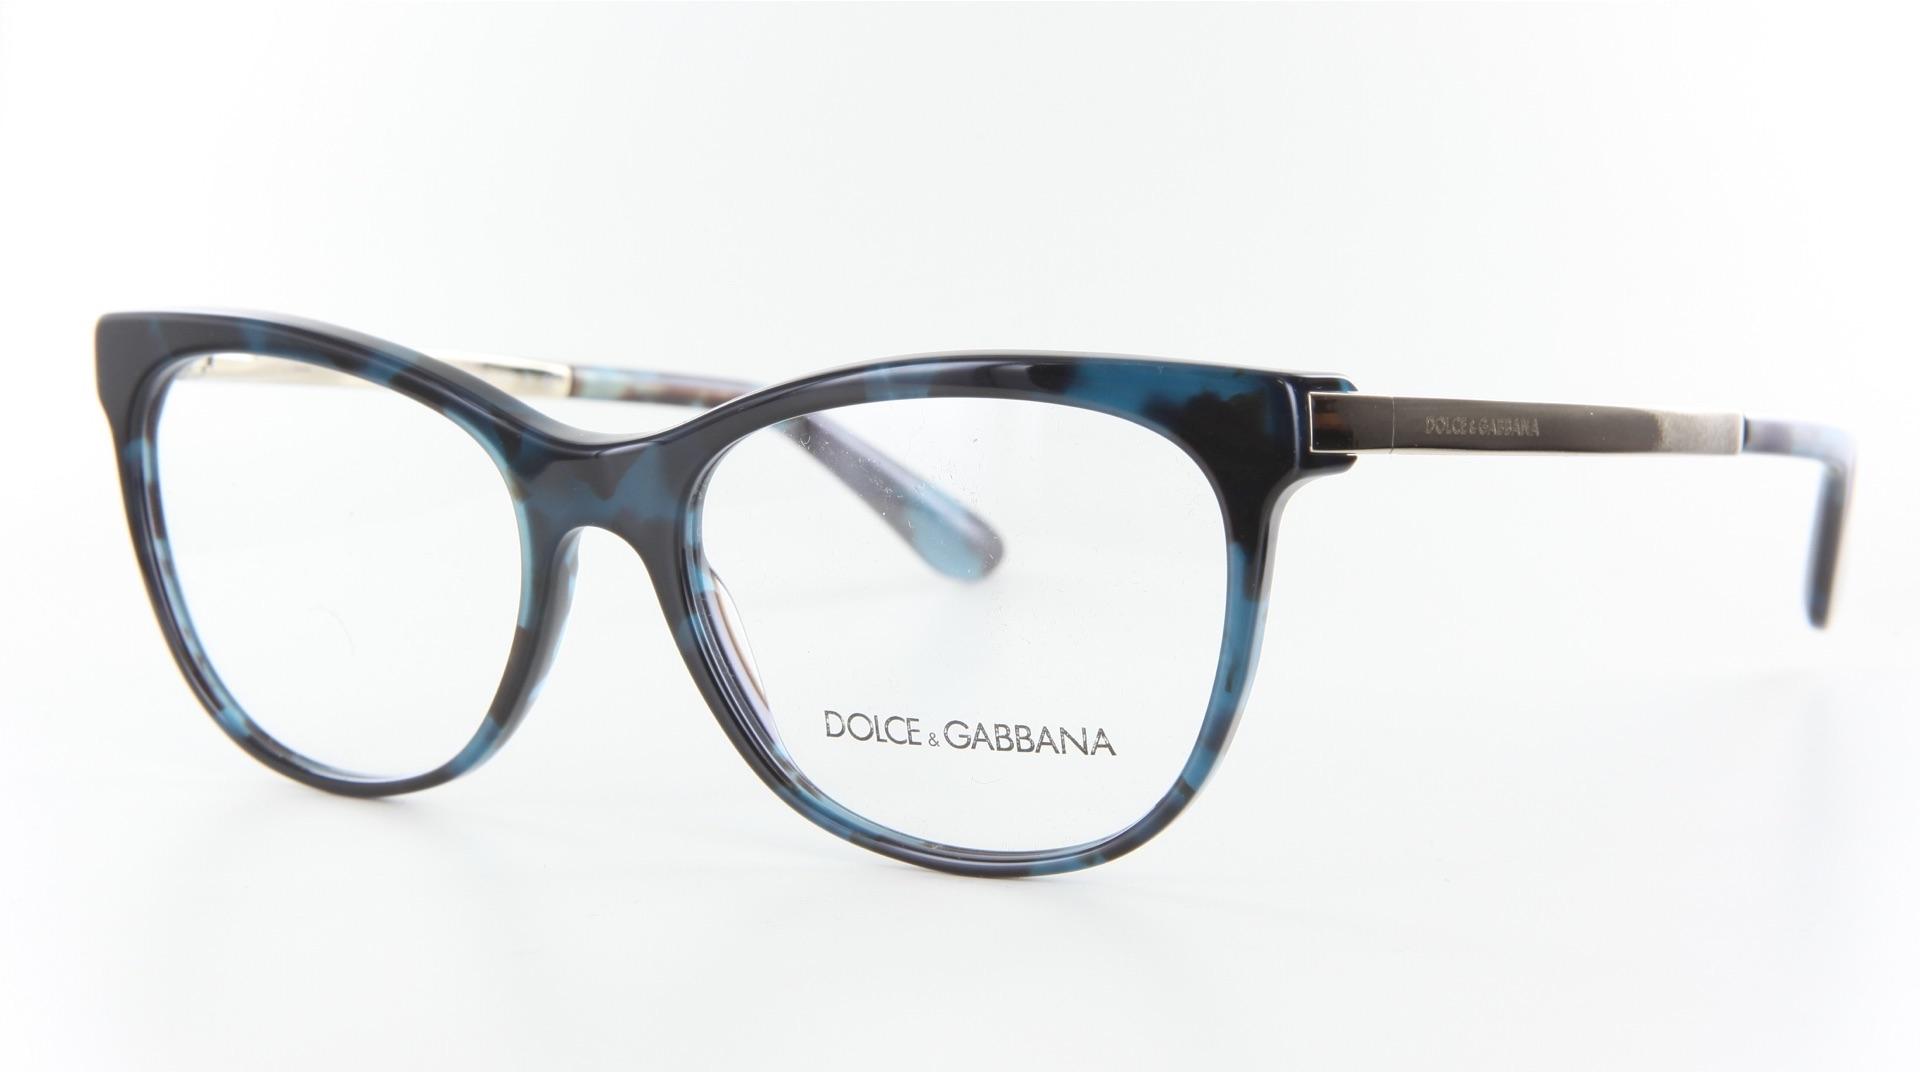 Dolce & Gabbana - ref: 74375